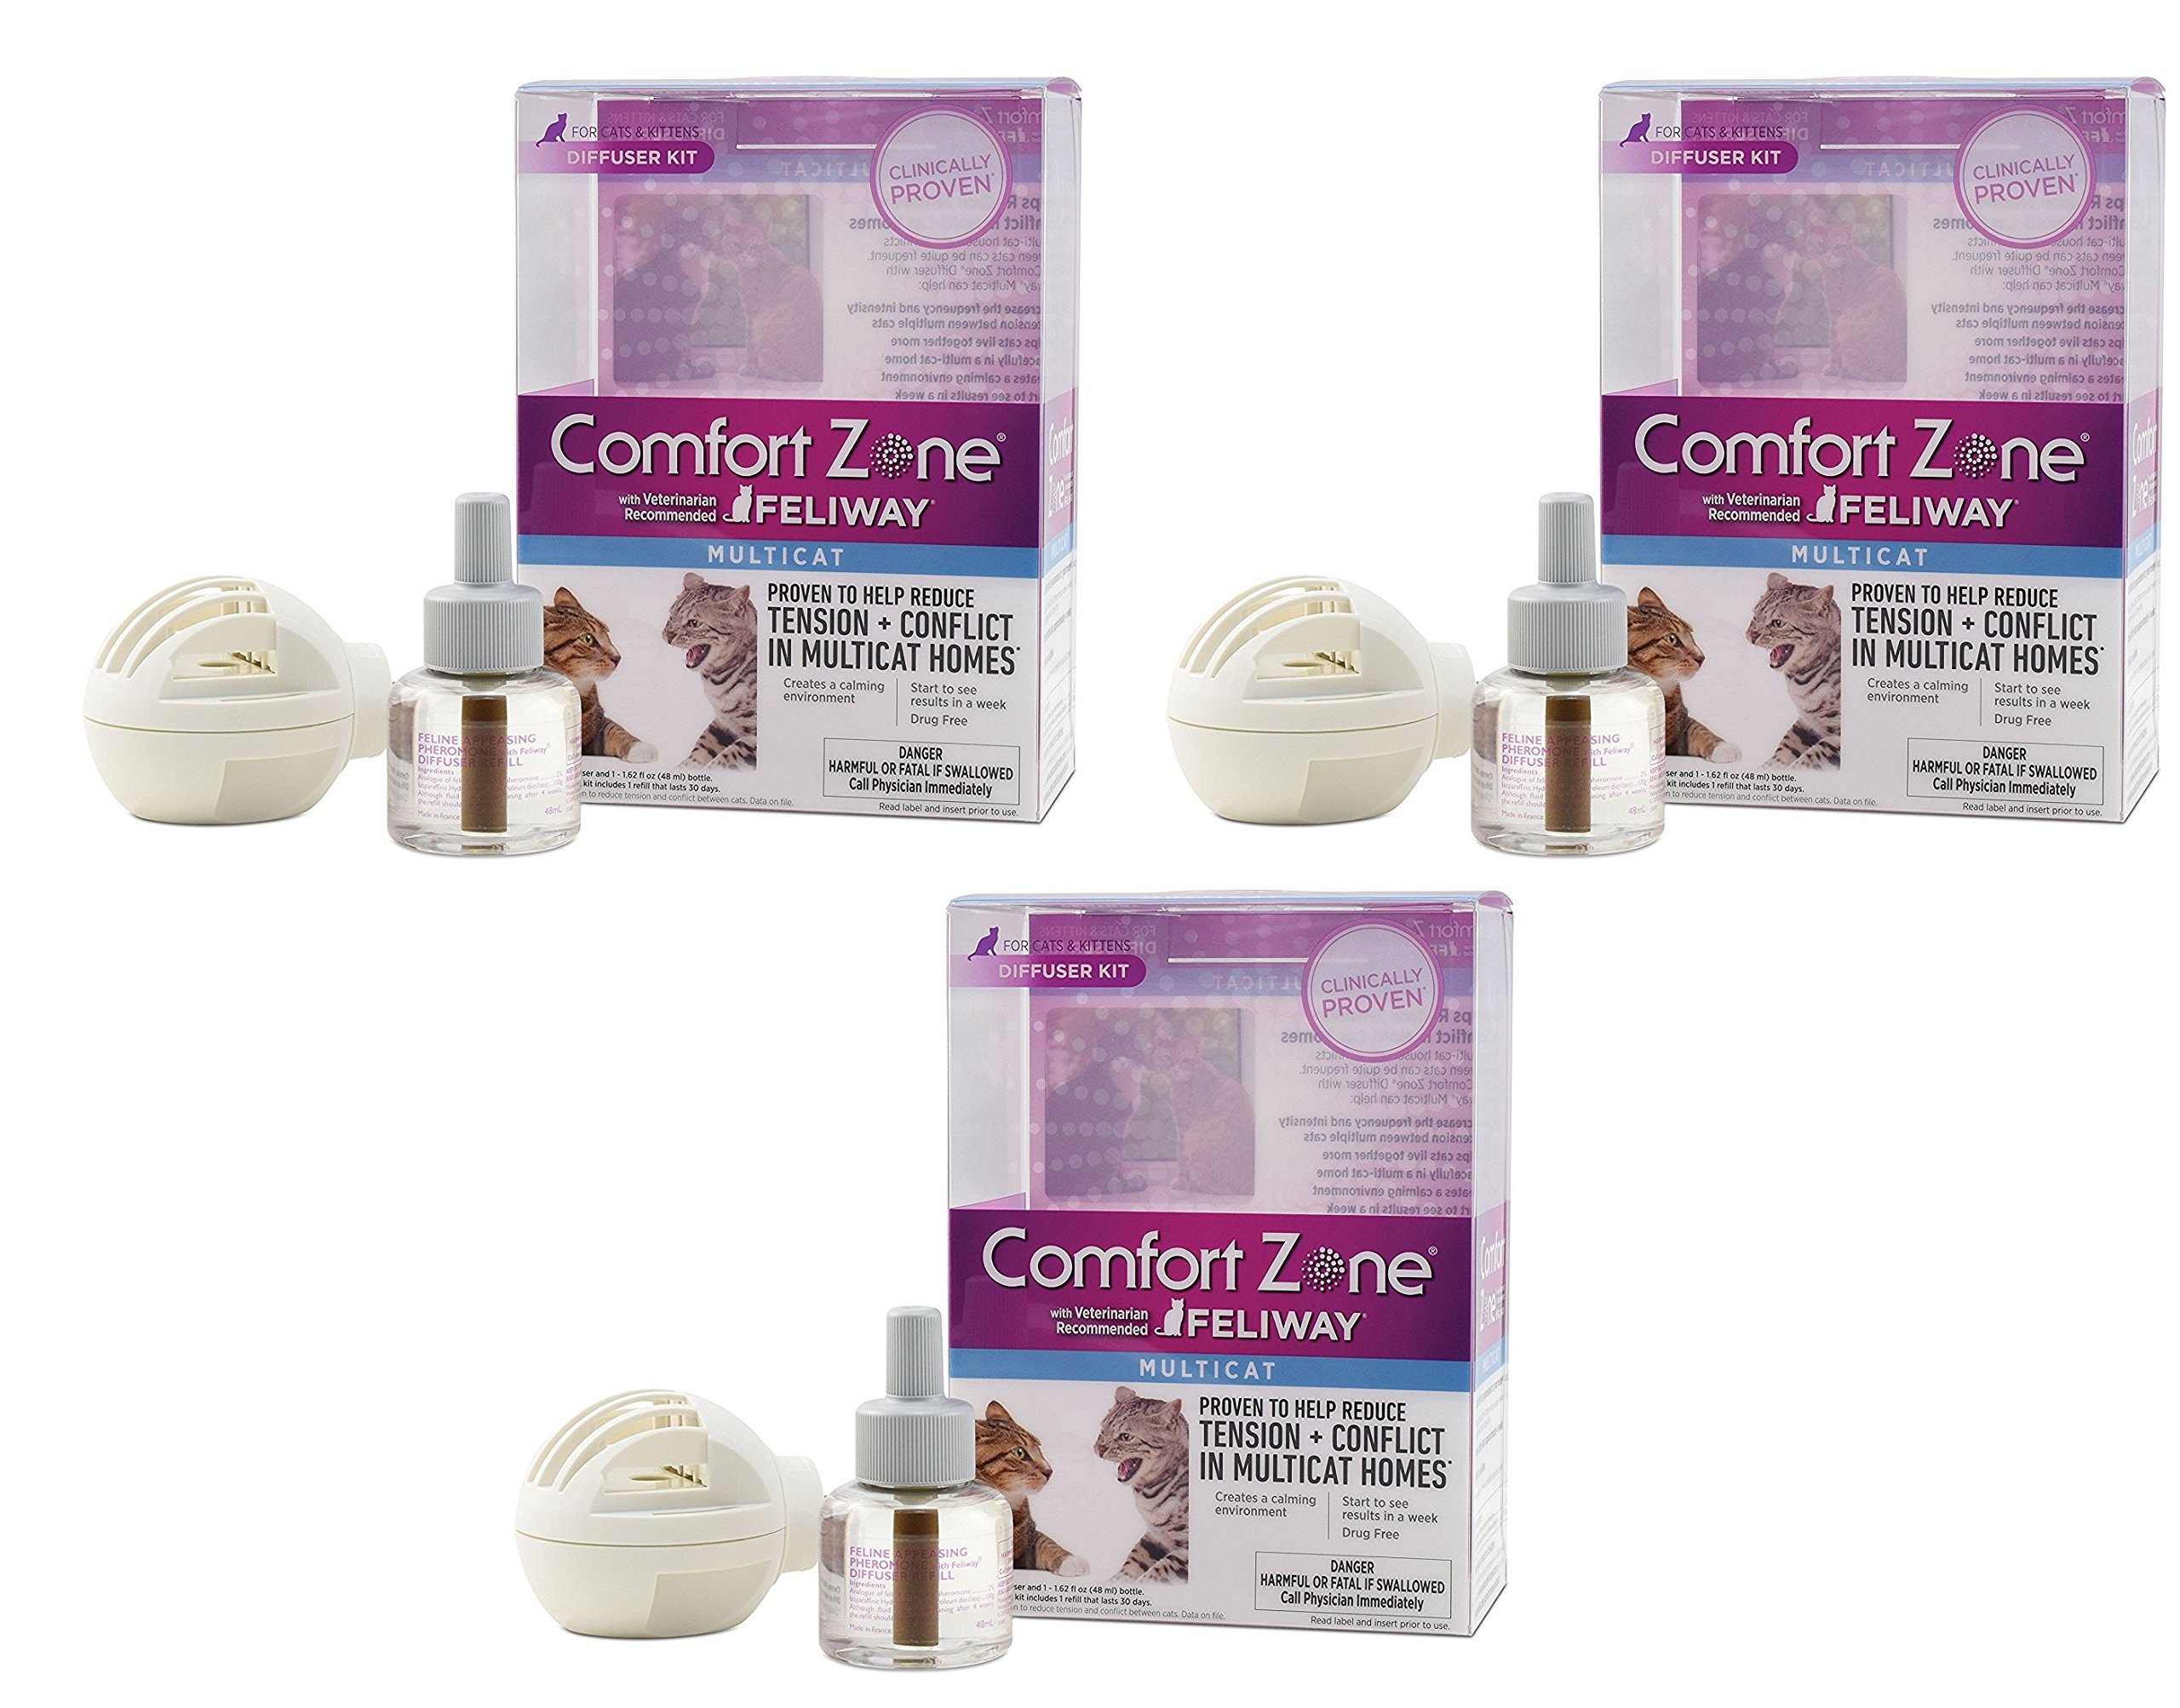 (3 Pack) Comfort Zone Feliway Multicat Diffuser and Refills